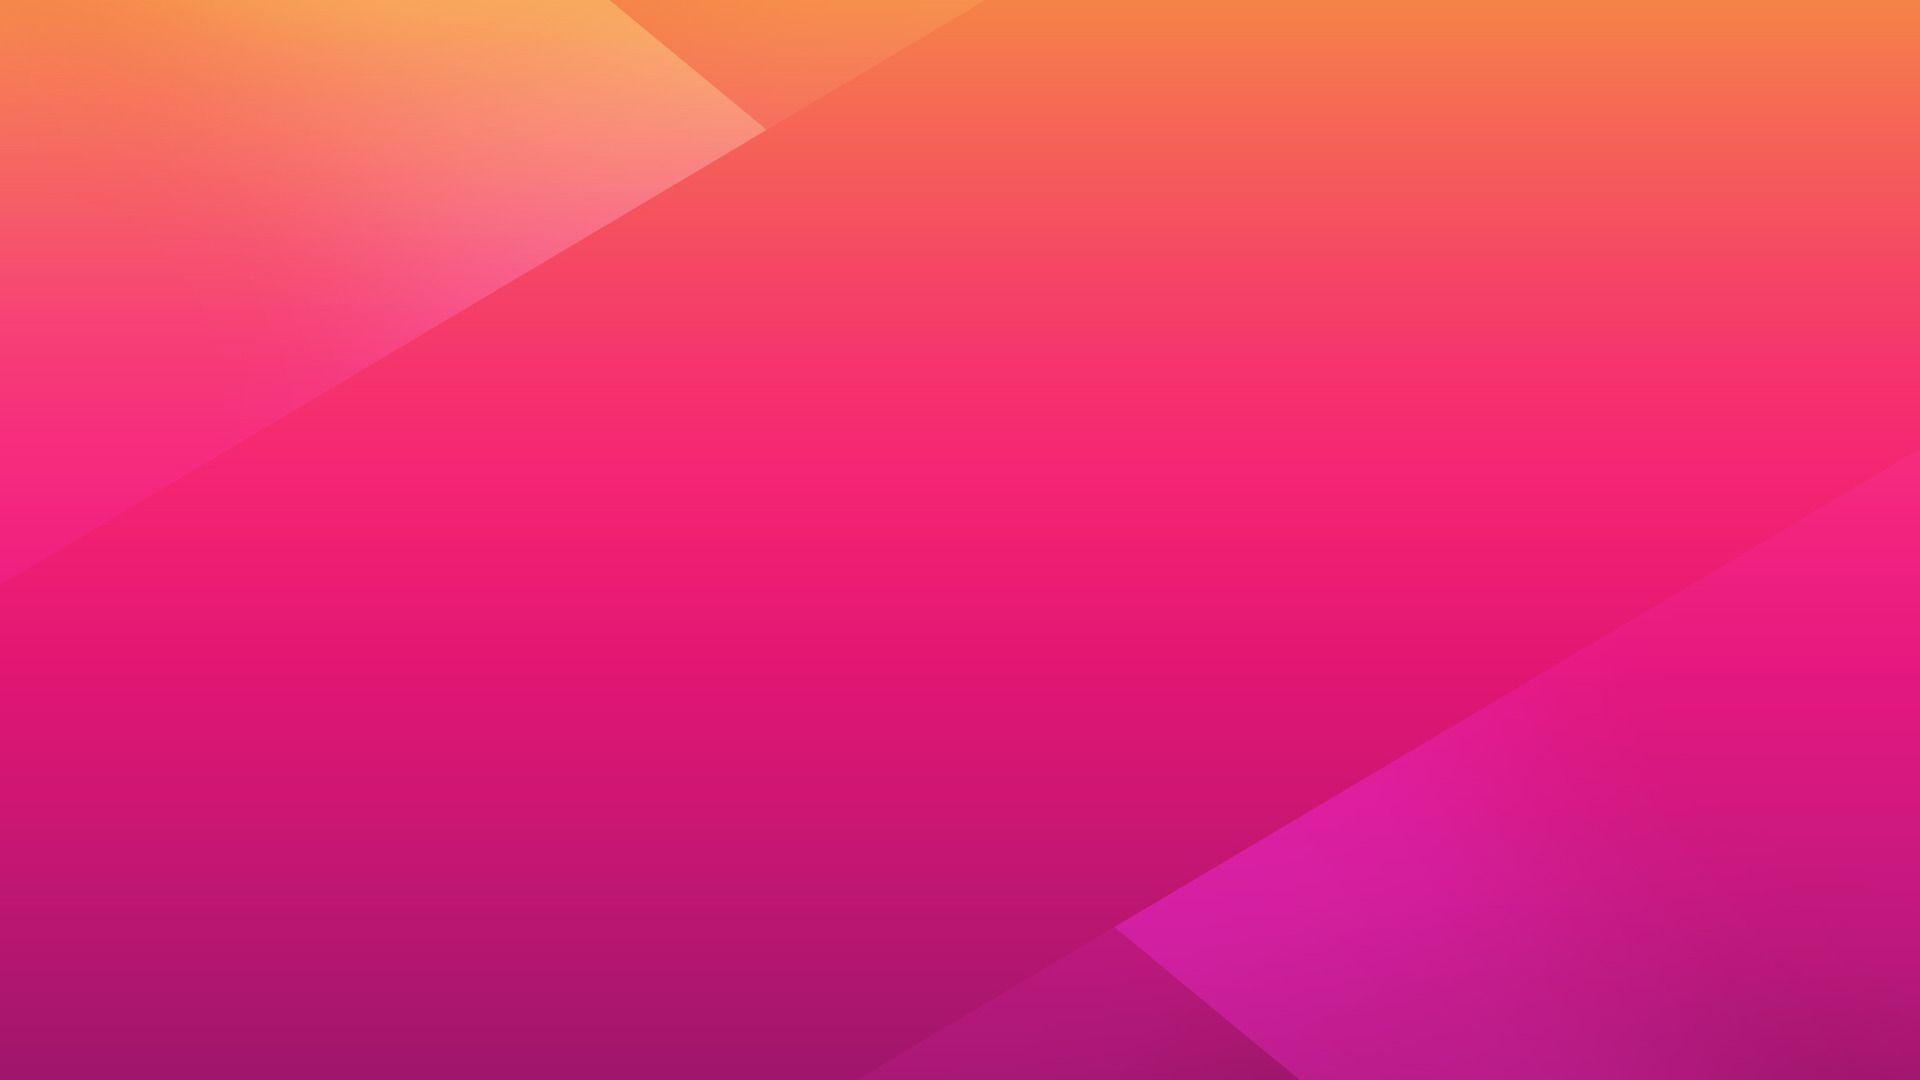 fondo rosado y naranja